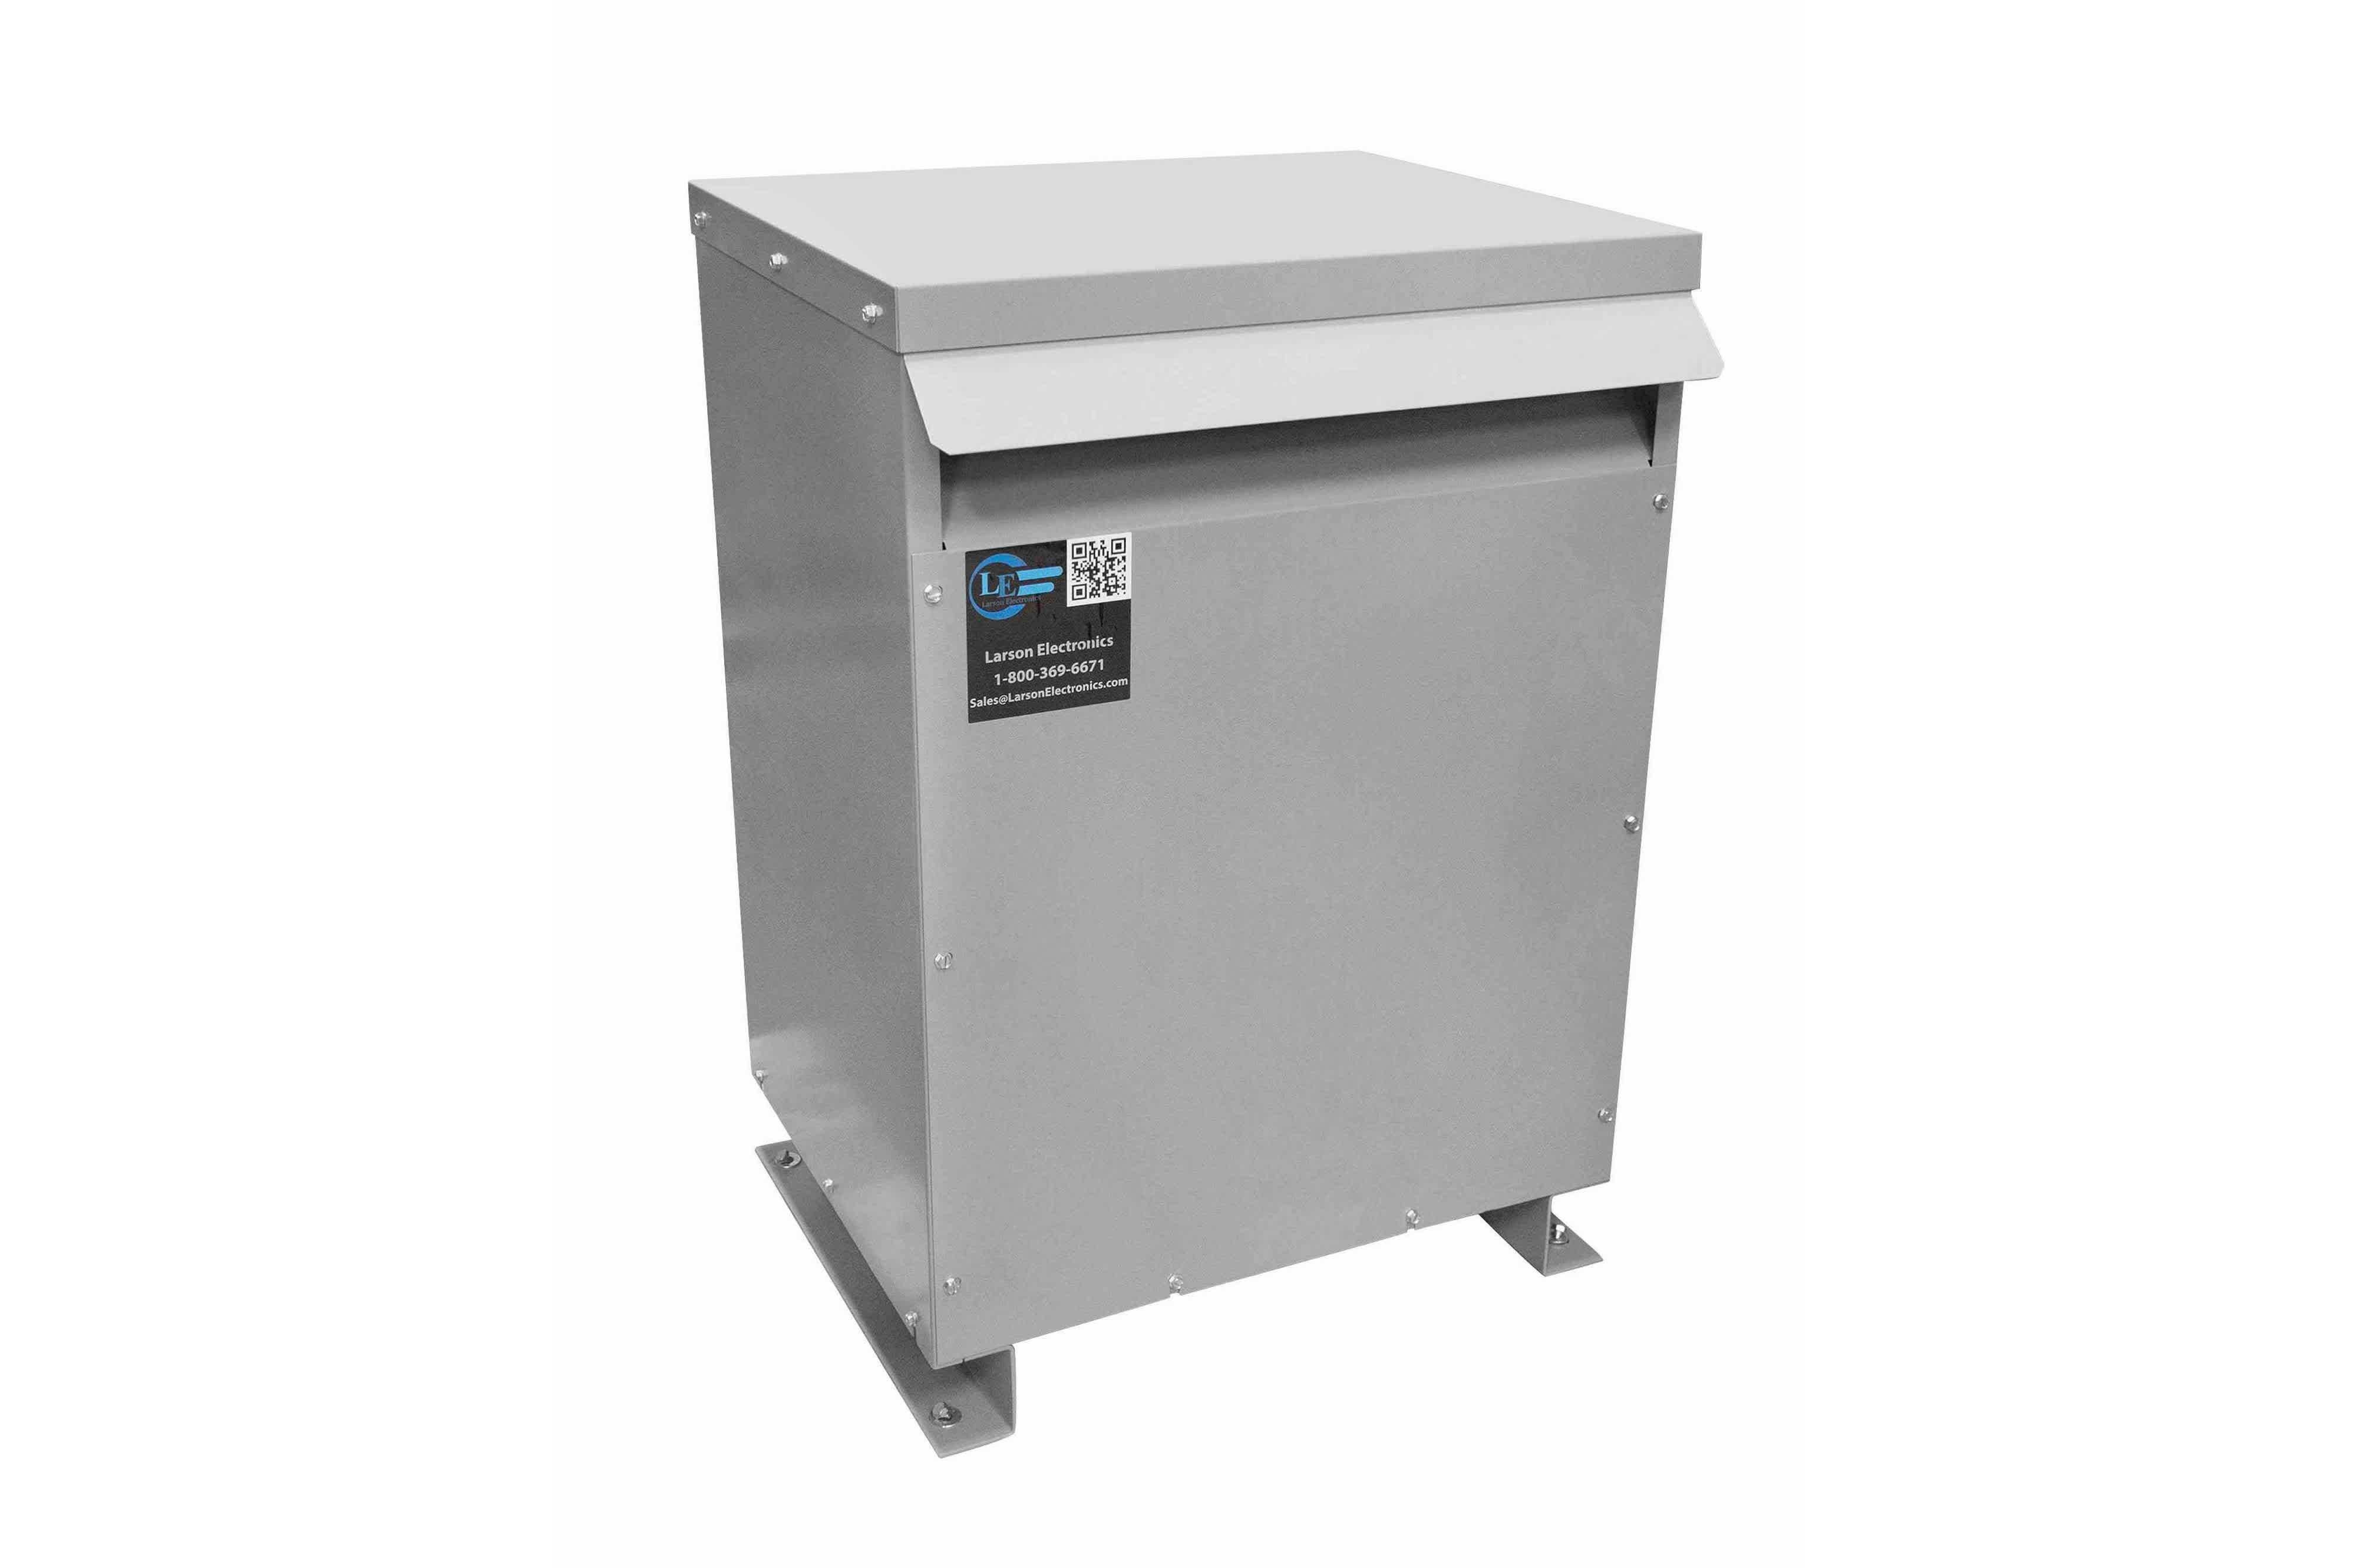 400 kVA 3PH DOE Transformer, 380V Delta Primary, 208Y/120 Wye-N Secondary, N3R, Ventilated, 60 Hz